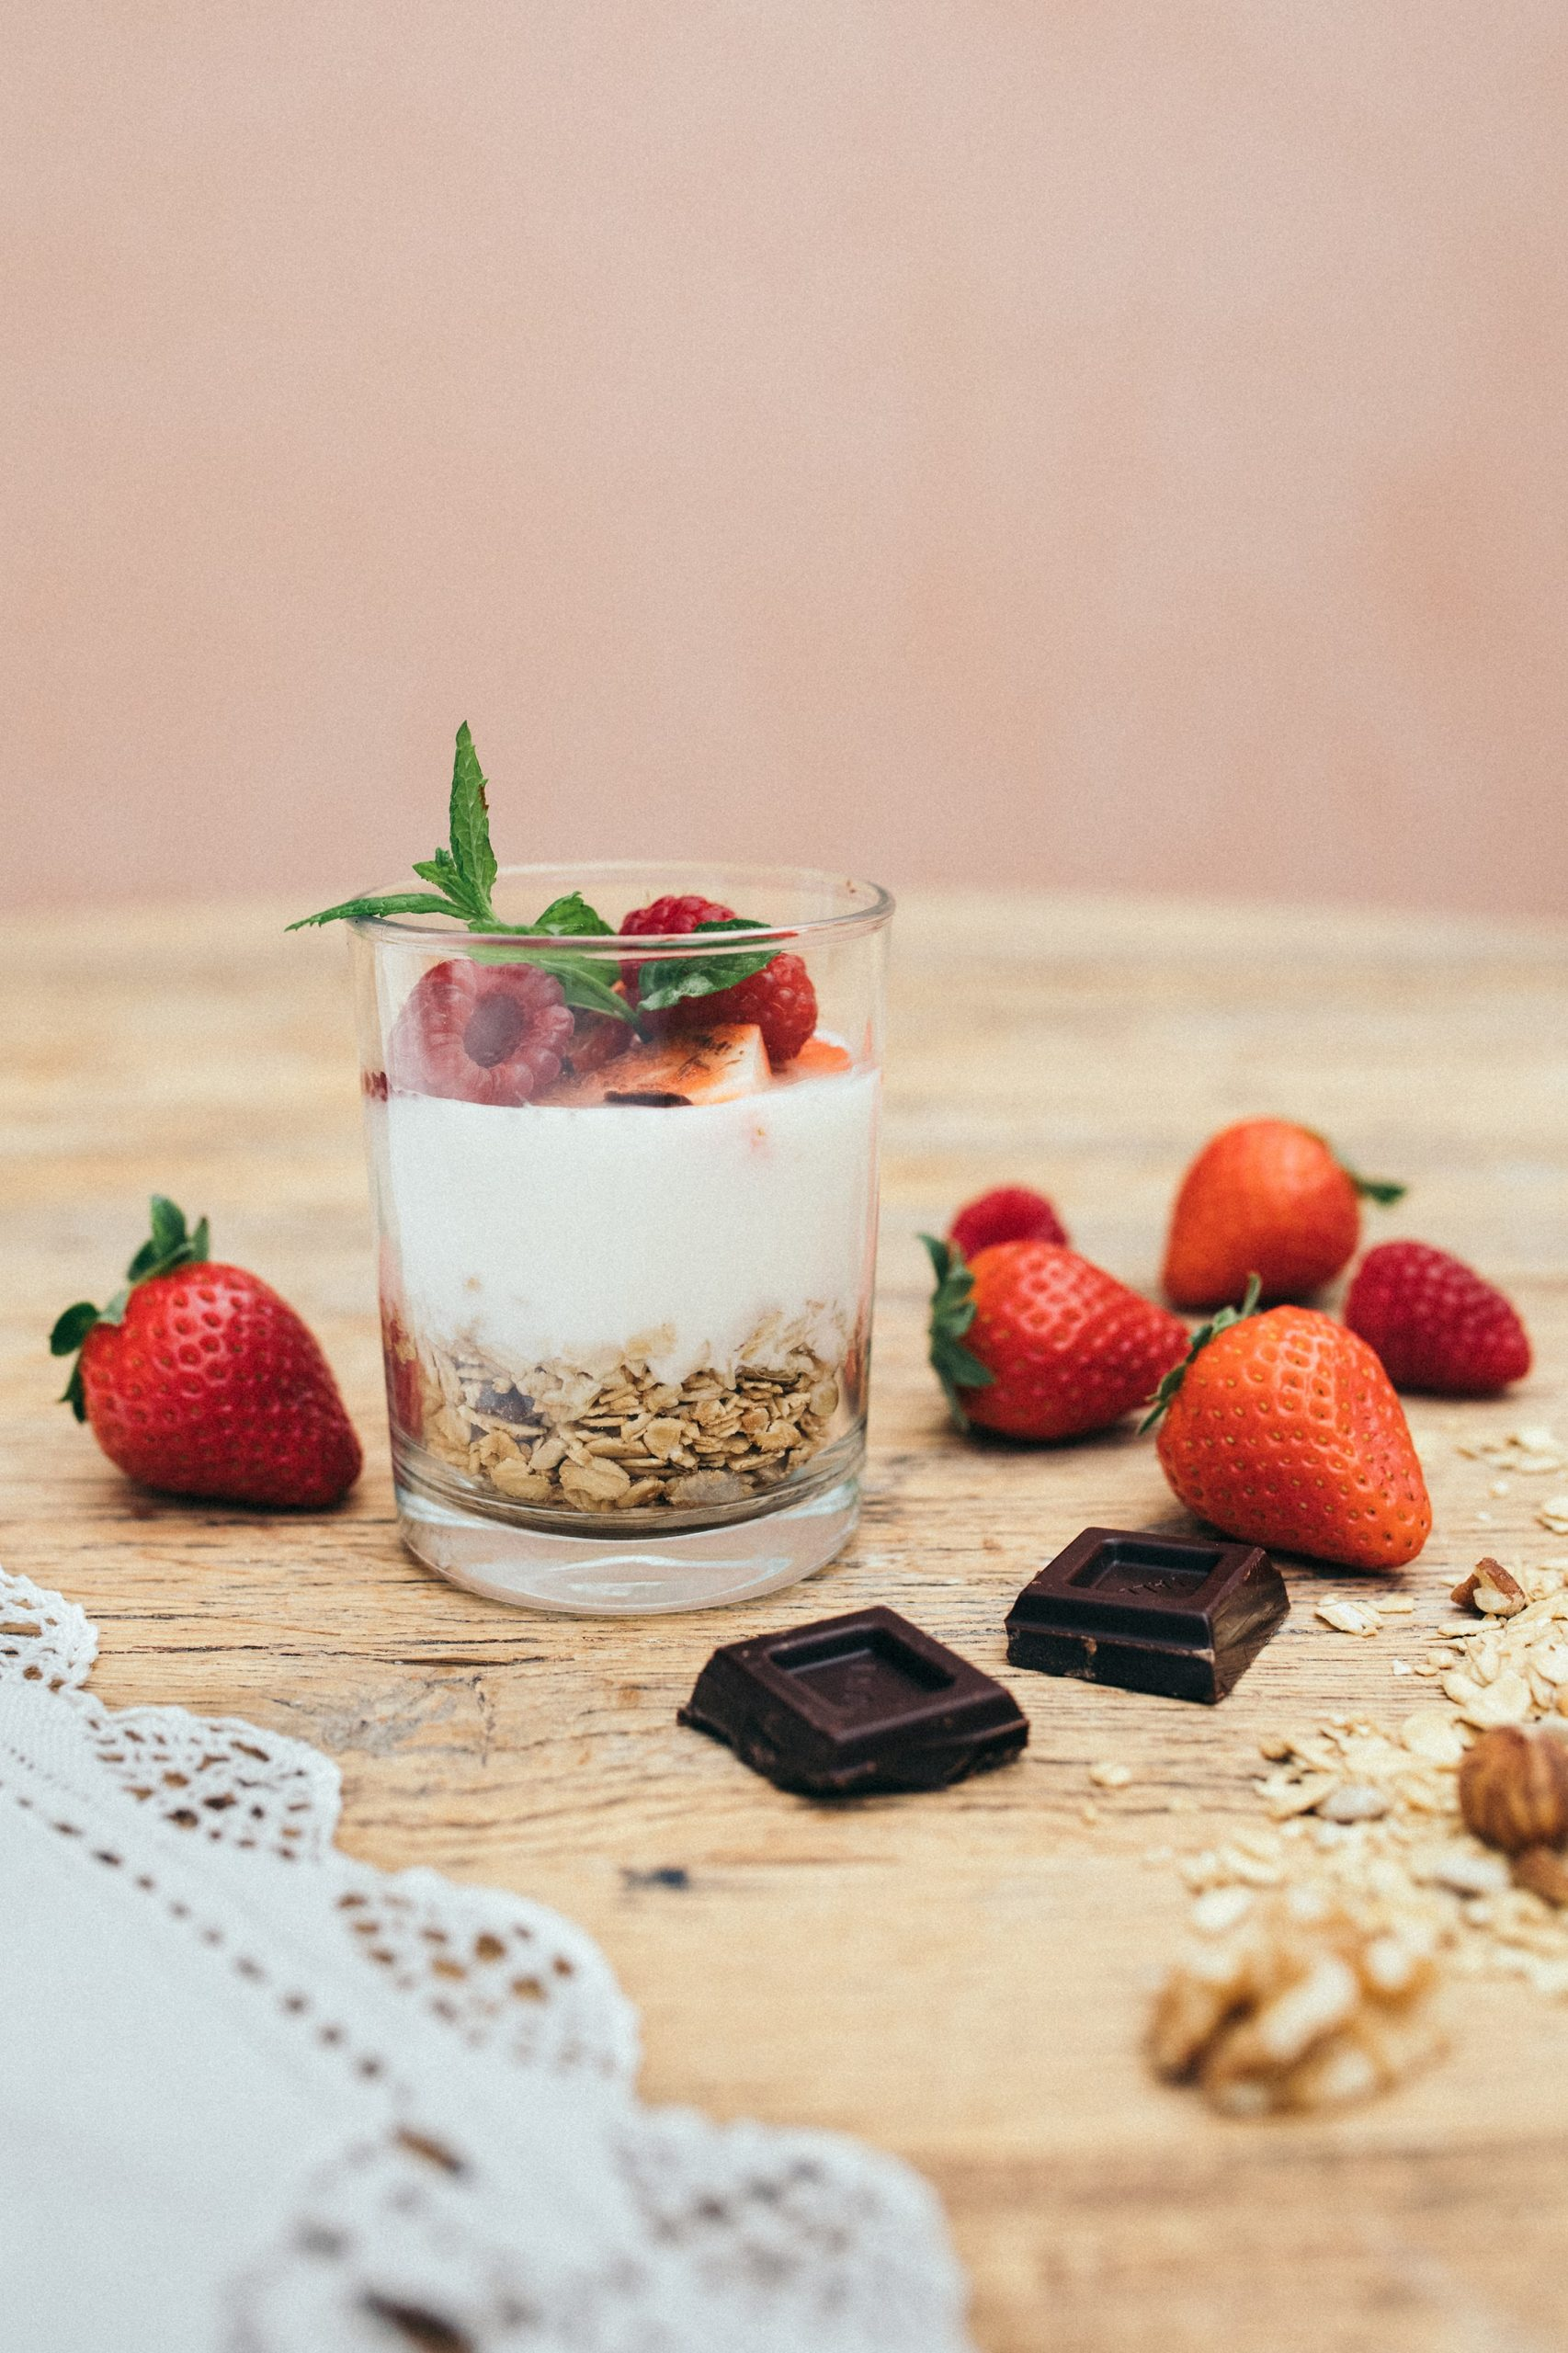 fotografía yogur artesanal